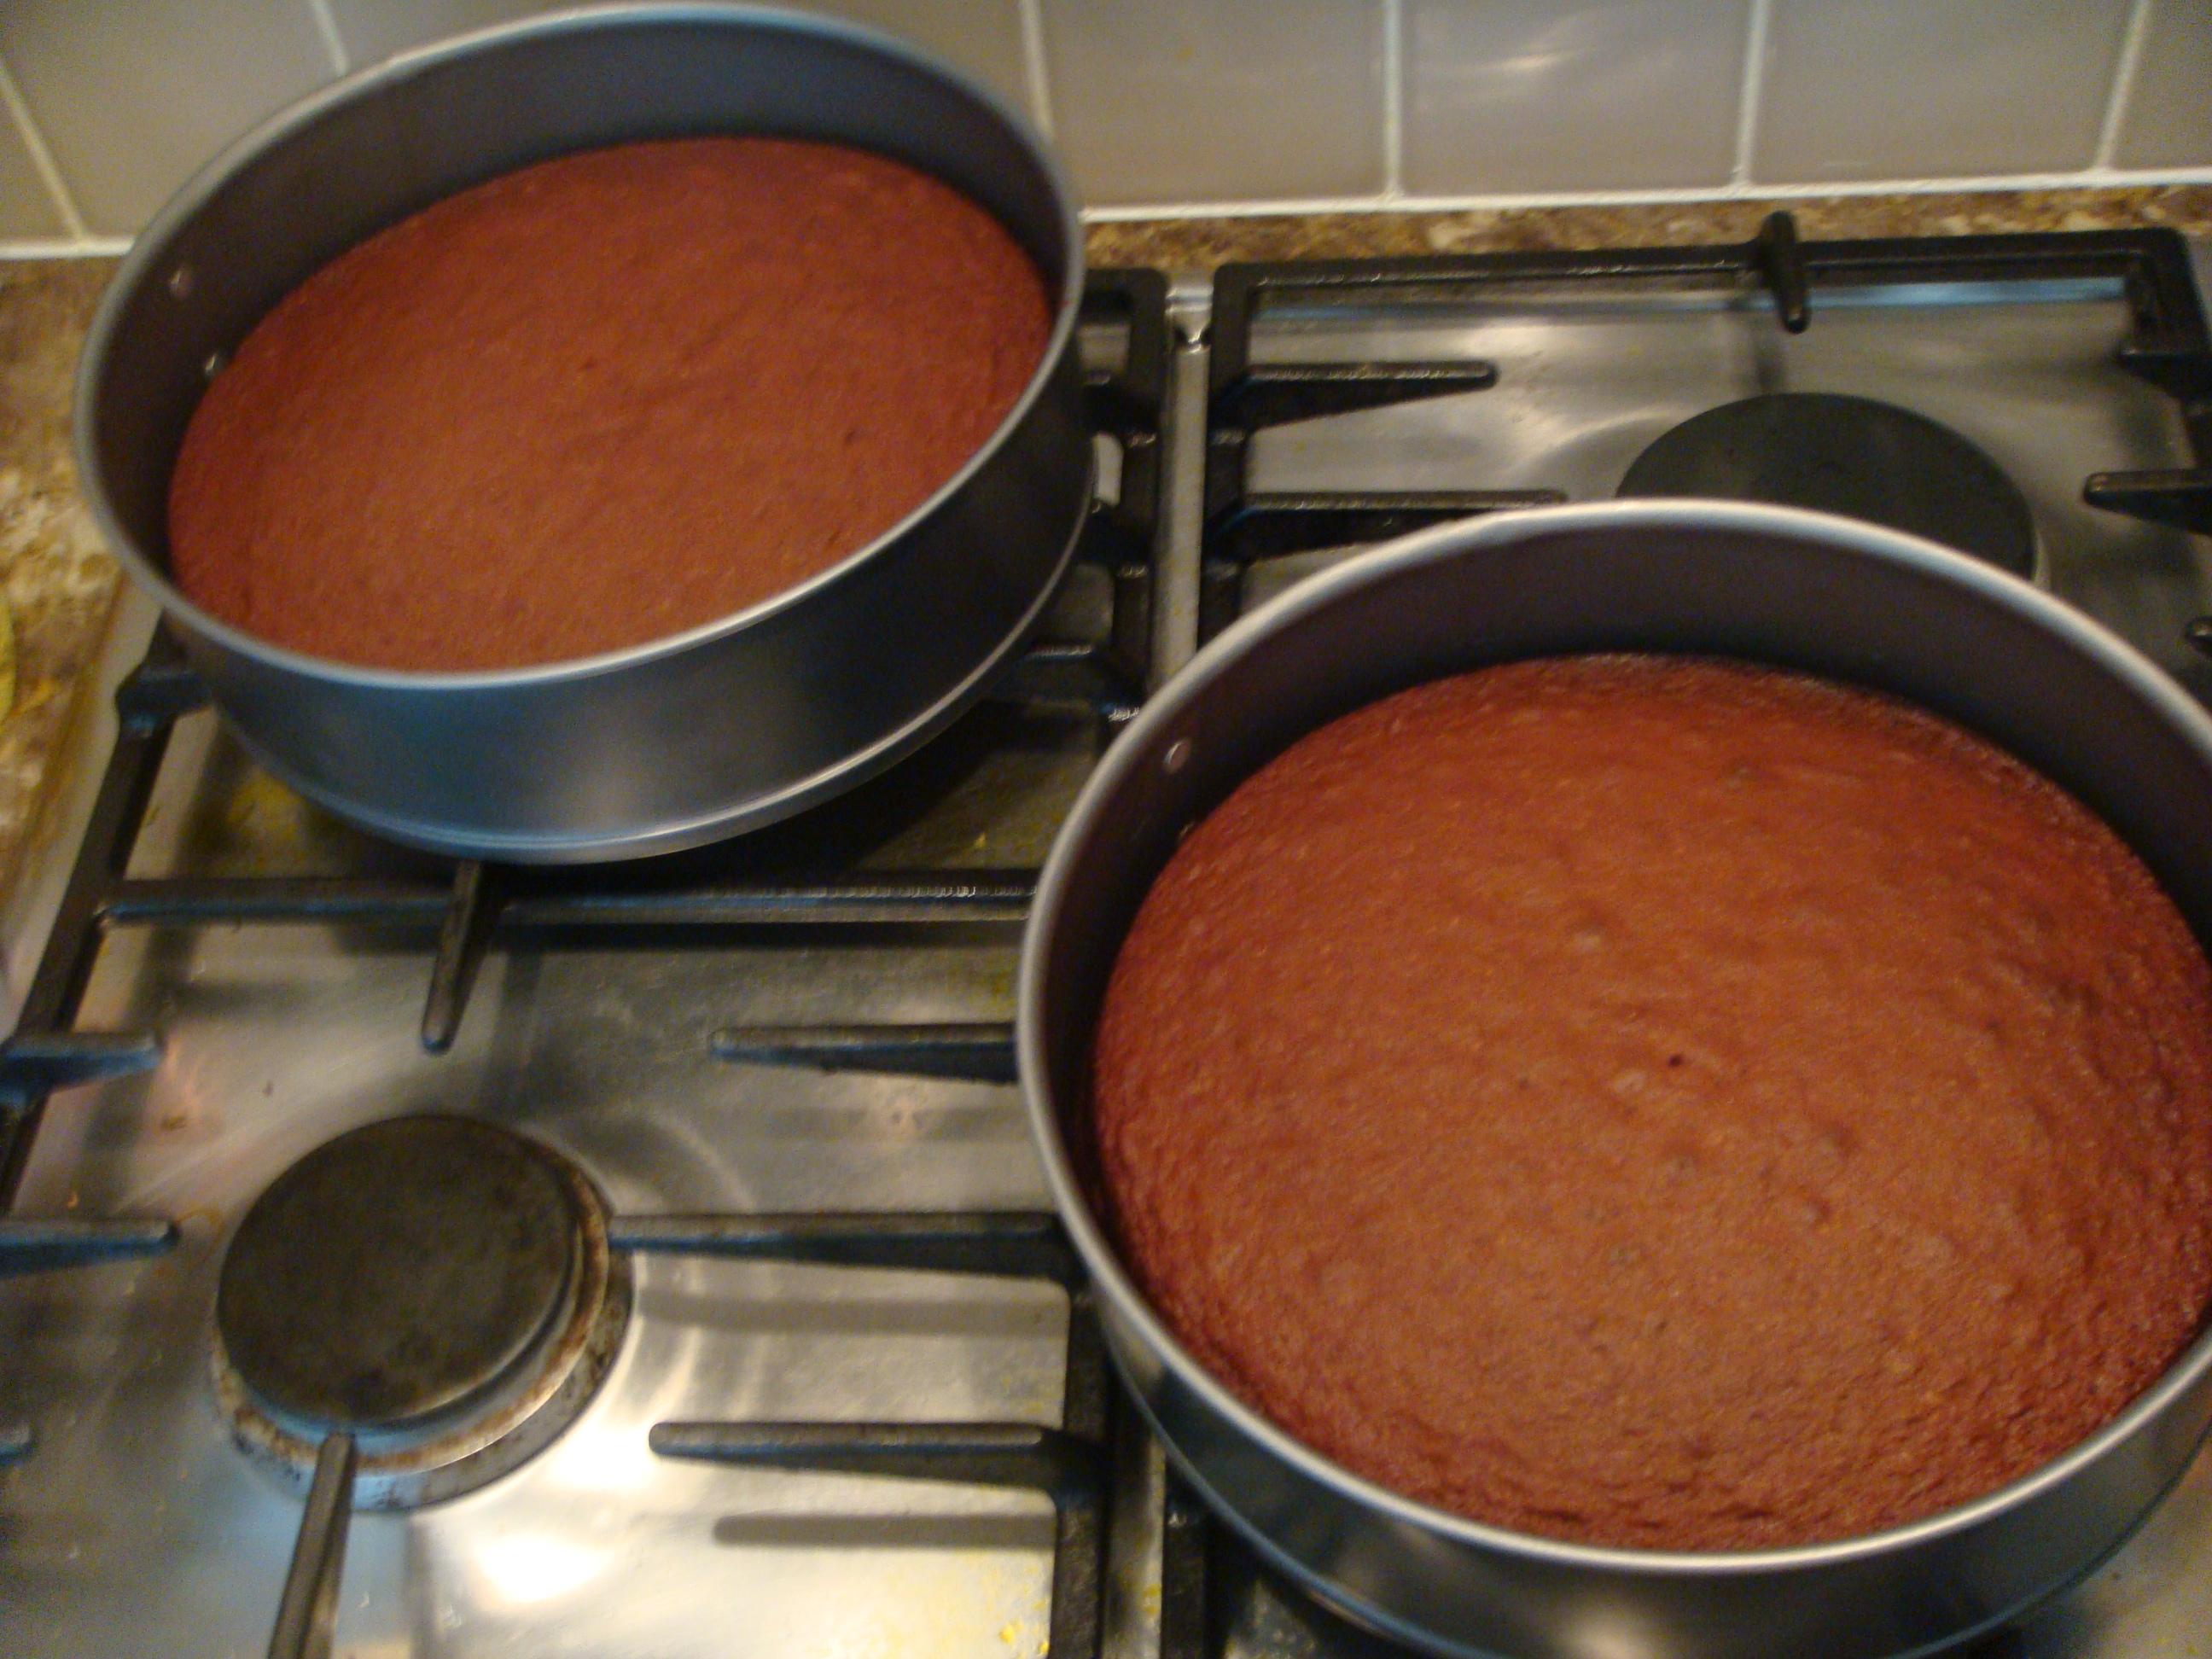 Betty Crocker choc fudge cakes